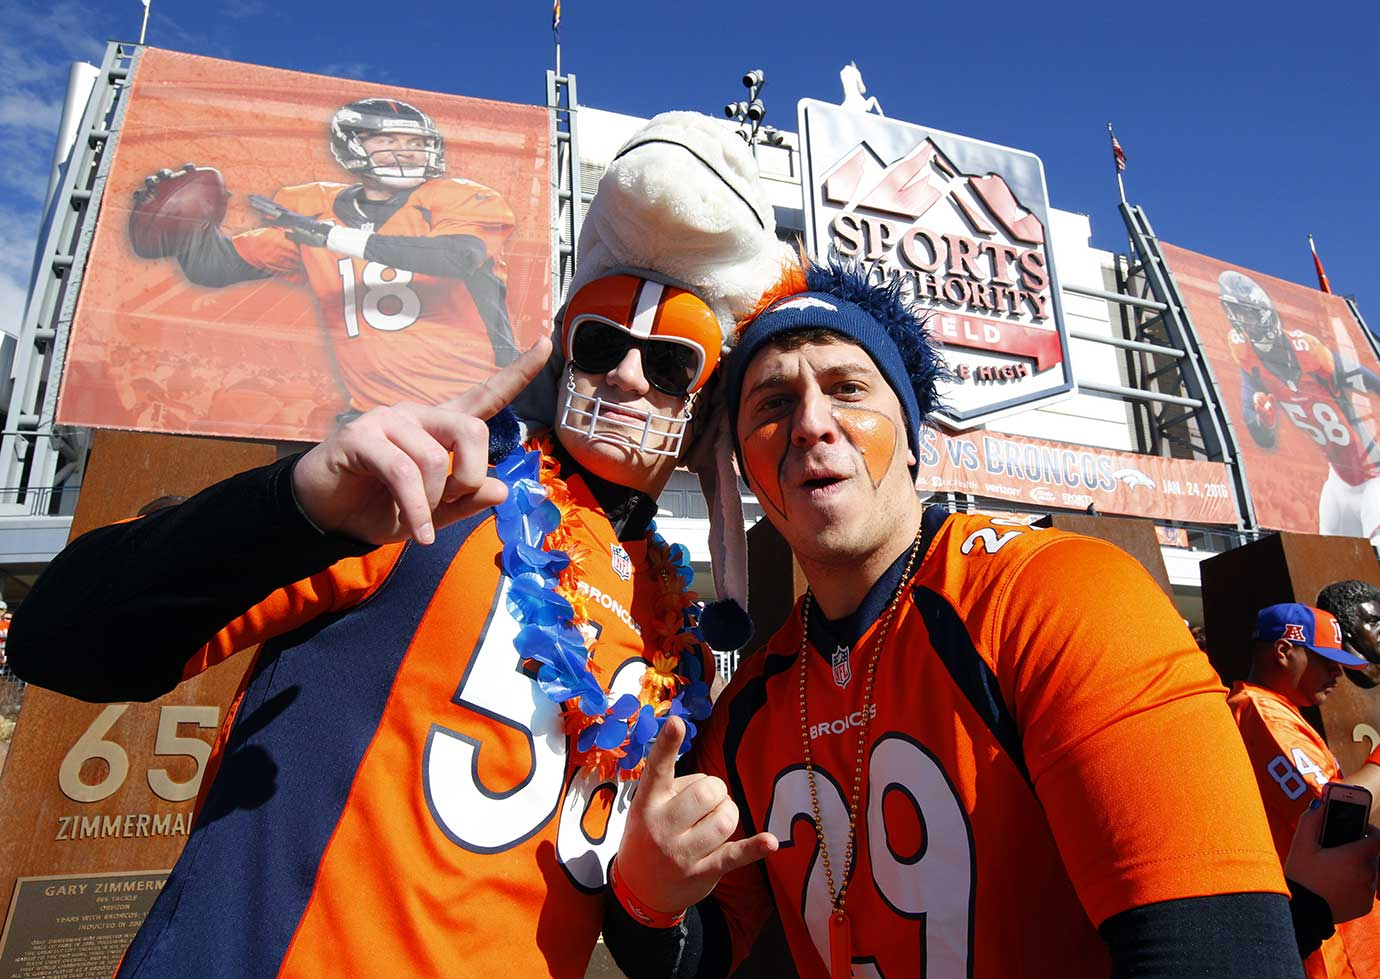 Denver Broncos fans wait to enter the stadium before the NFL AFC Championship game.